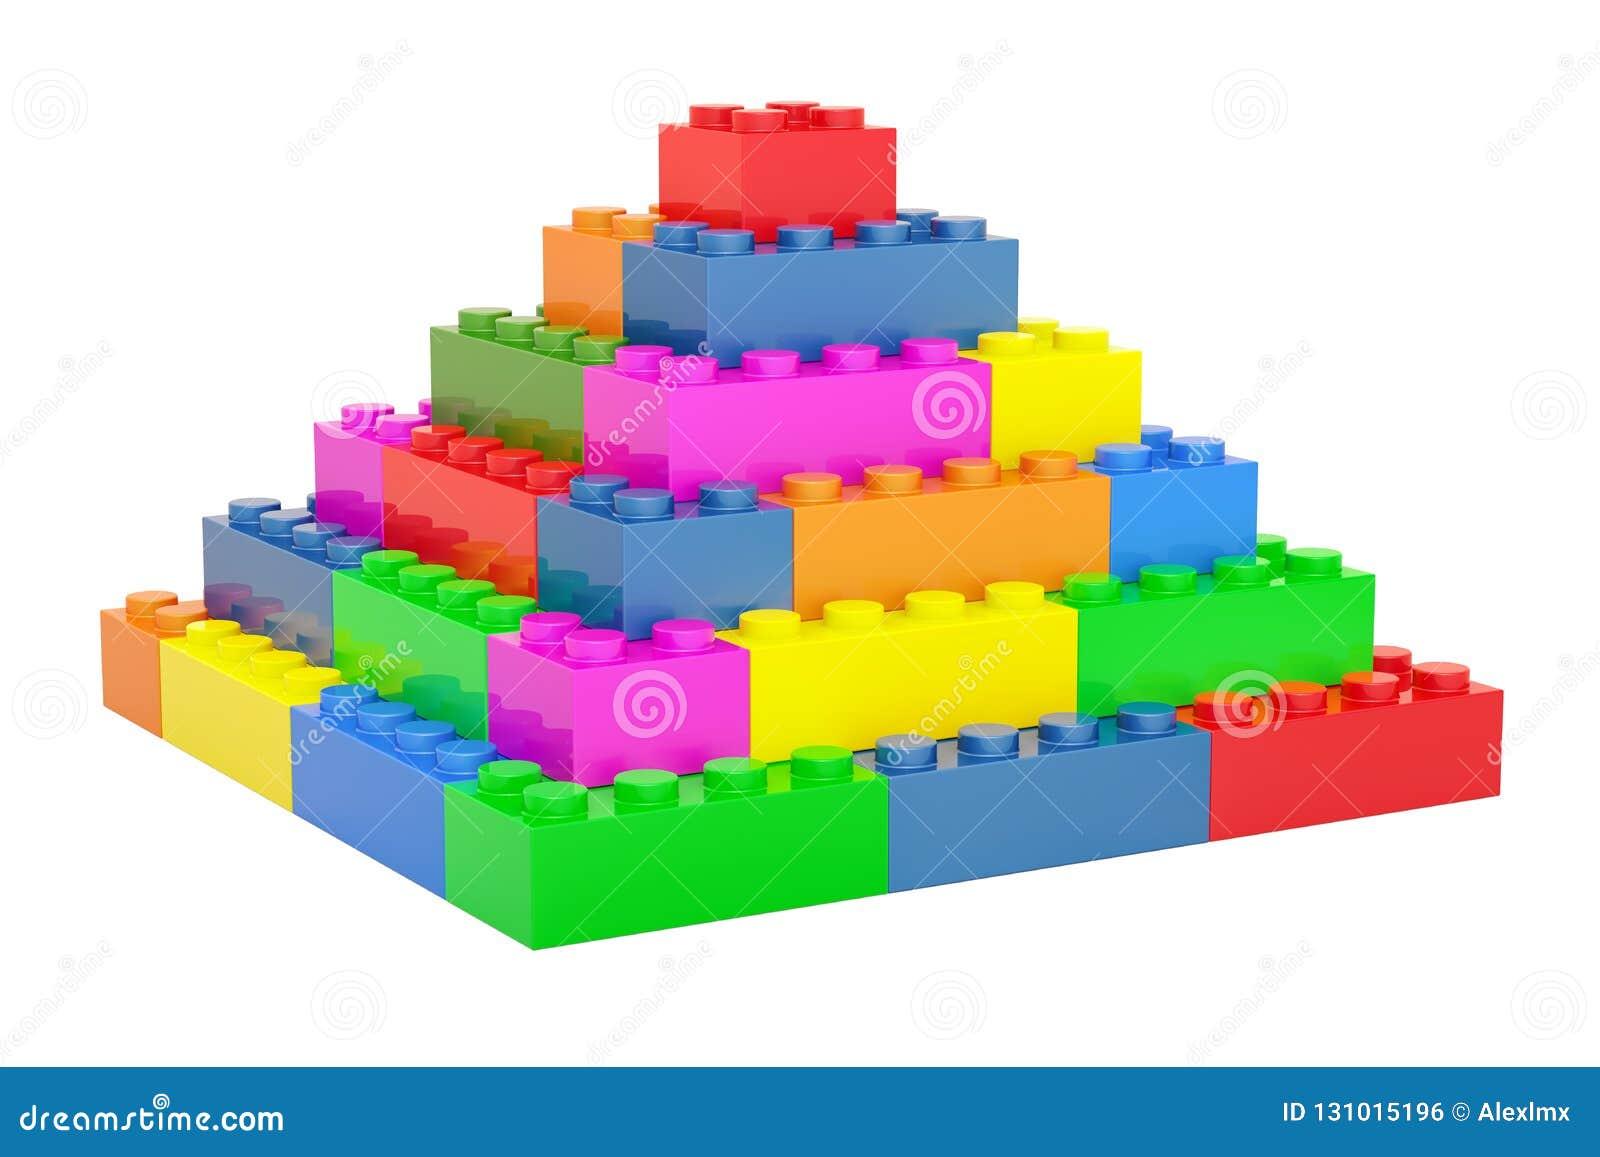 Pyramid From Plastic Building Blocks, 3D Stock Illustration